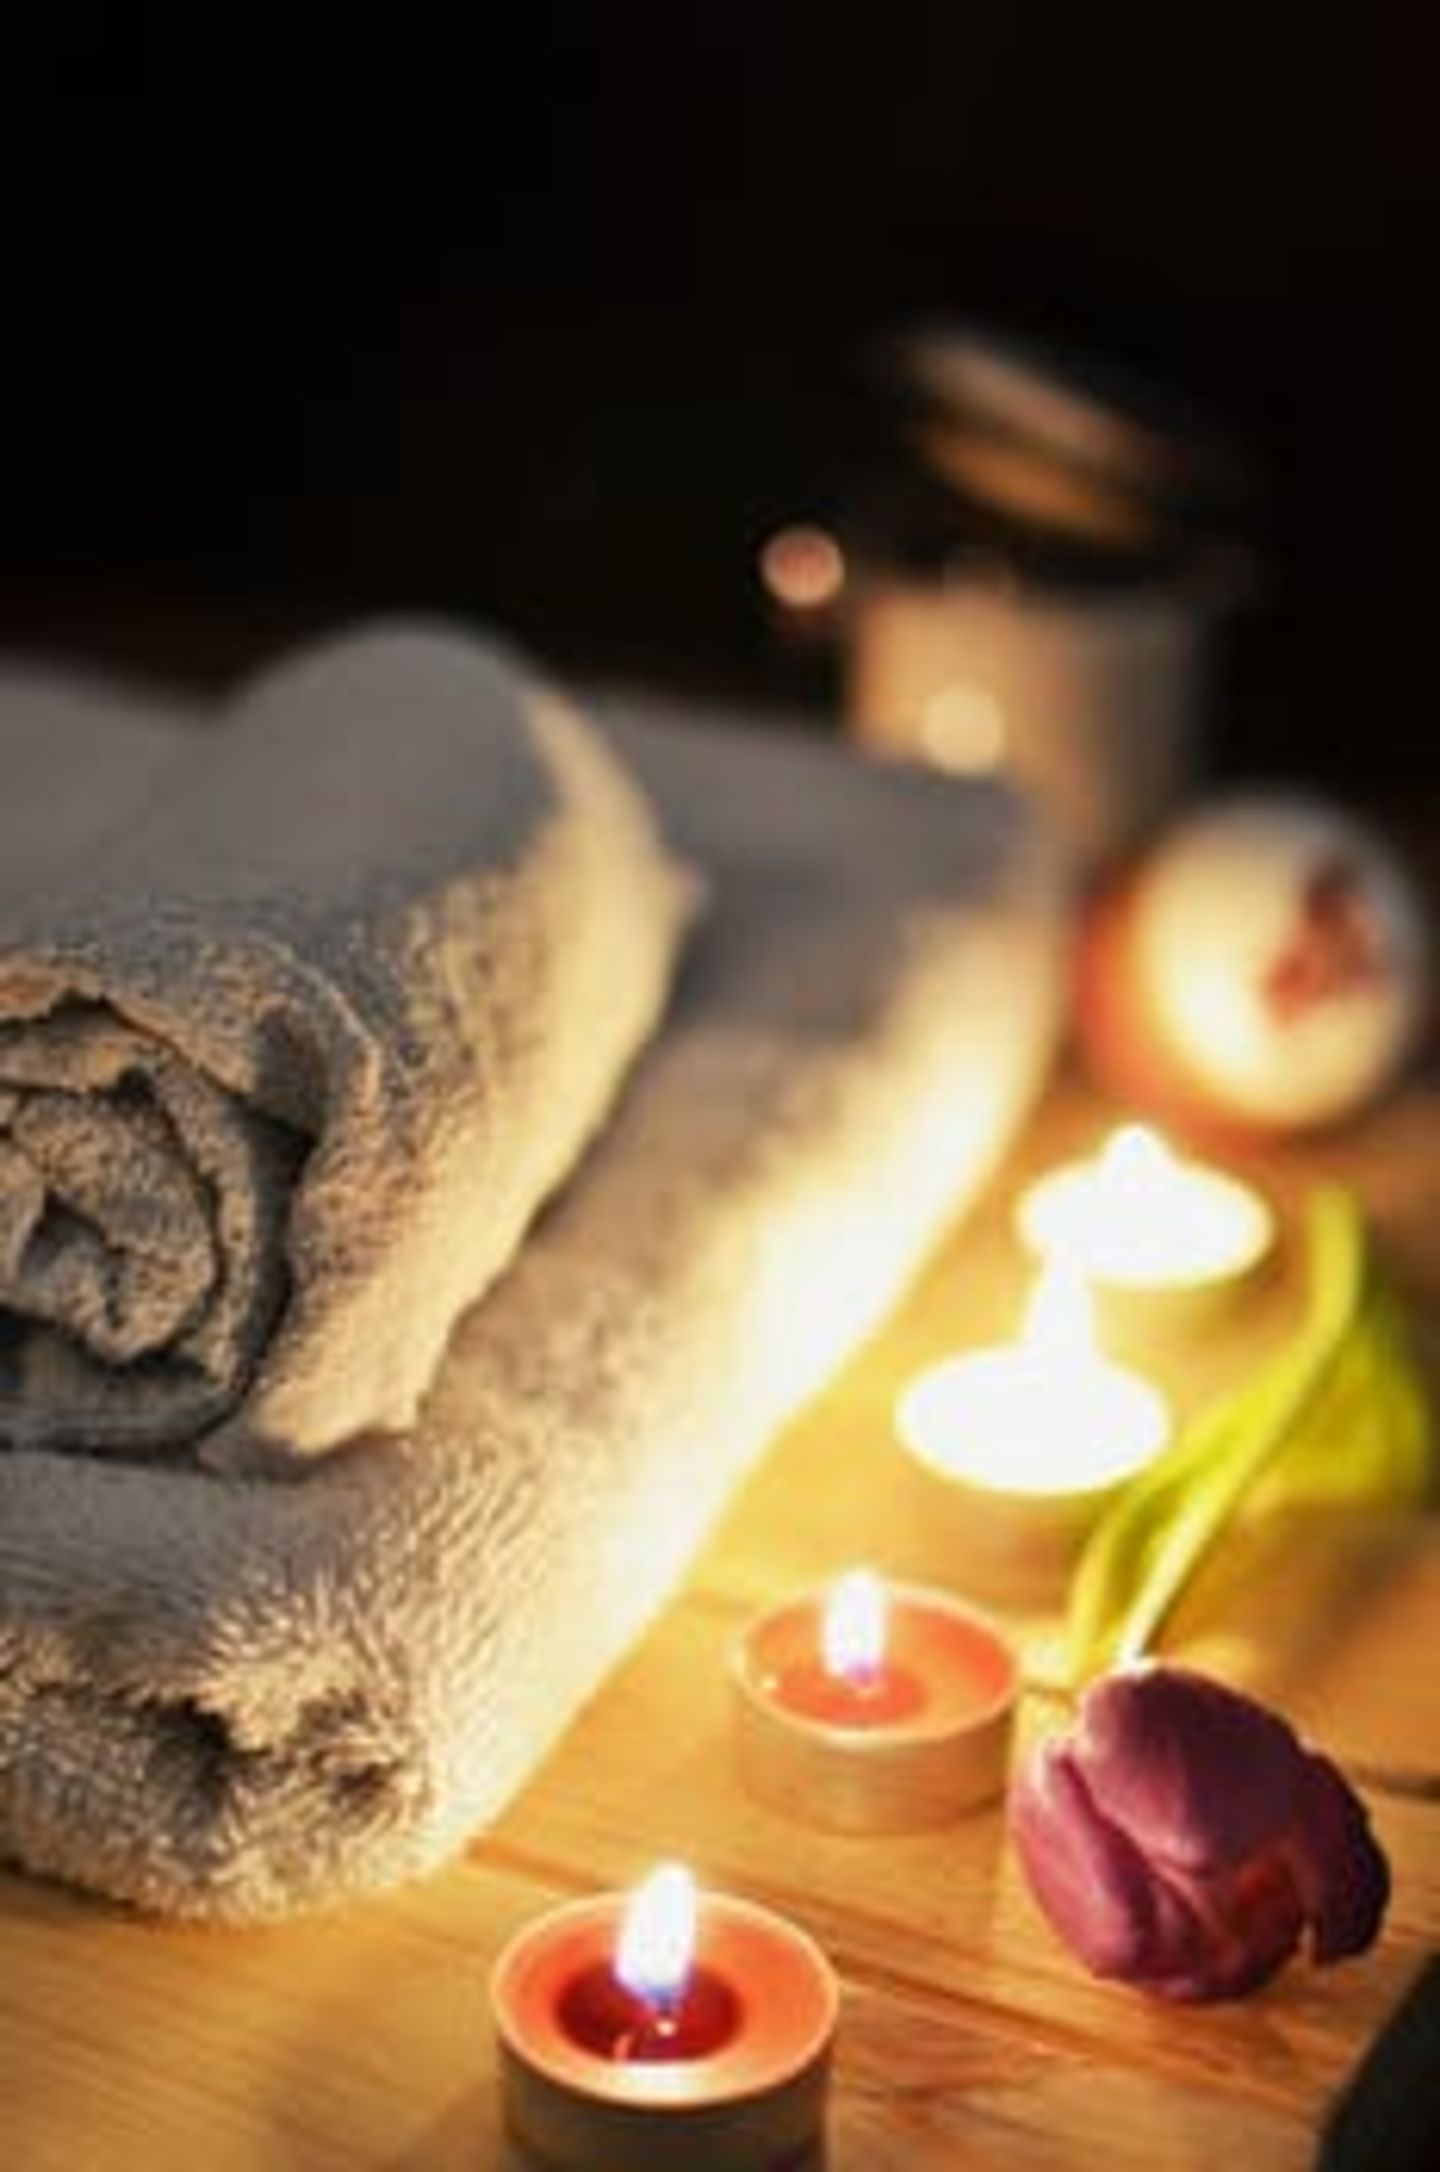 HiDubai-business-dream-valley-massage-center-beauty-wellness-health-wellness-services-spas-al-khabaisi-dubai